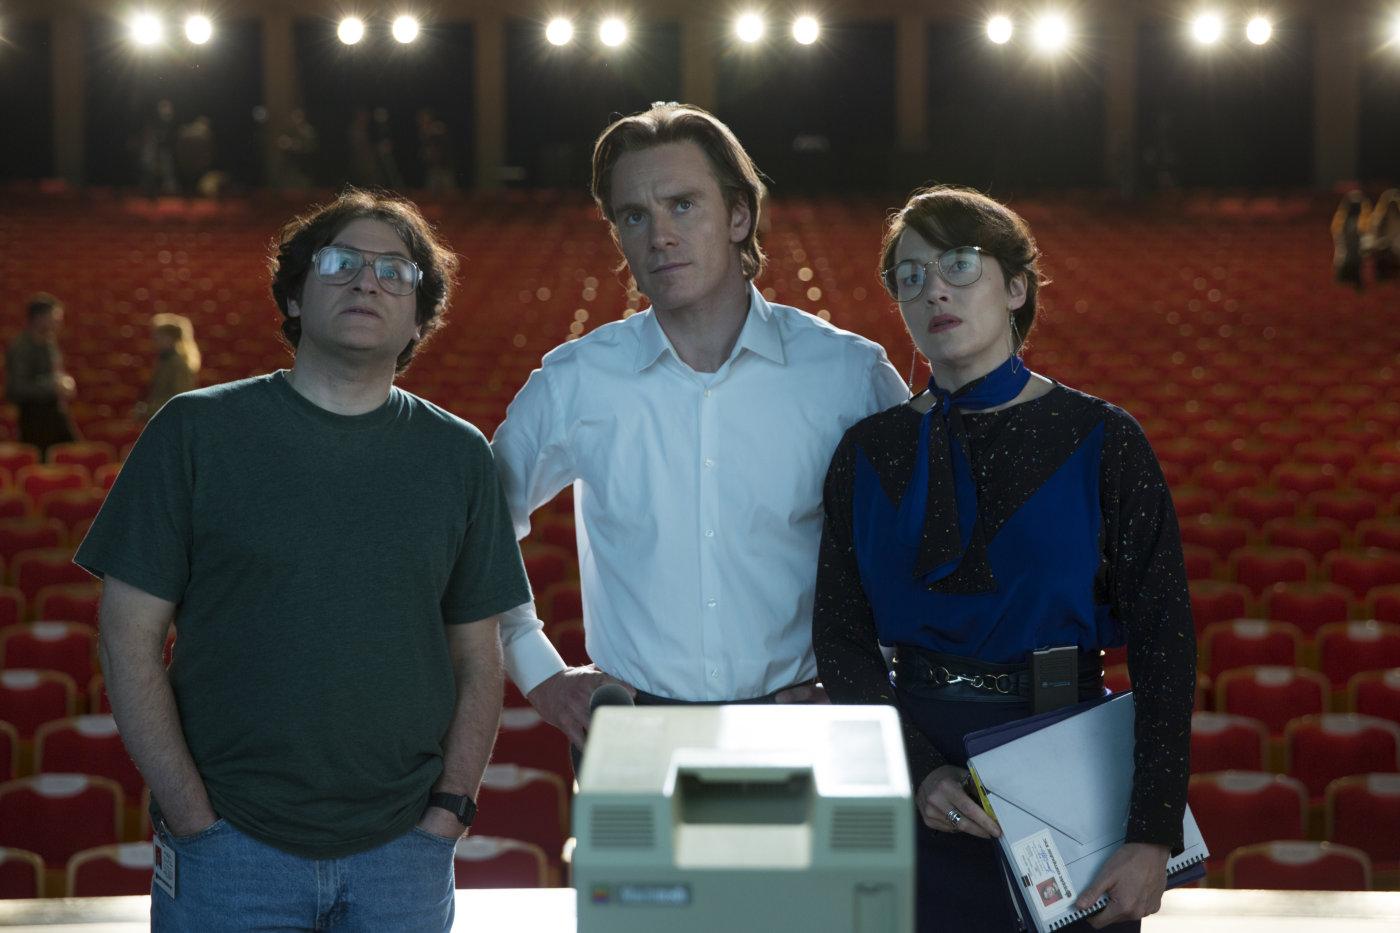 Стив Джобс (Steve Jobs, США, Великобритания, 2015) Режиссёр: Дэнни Бойл